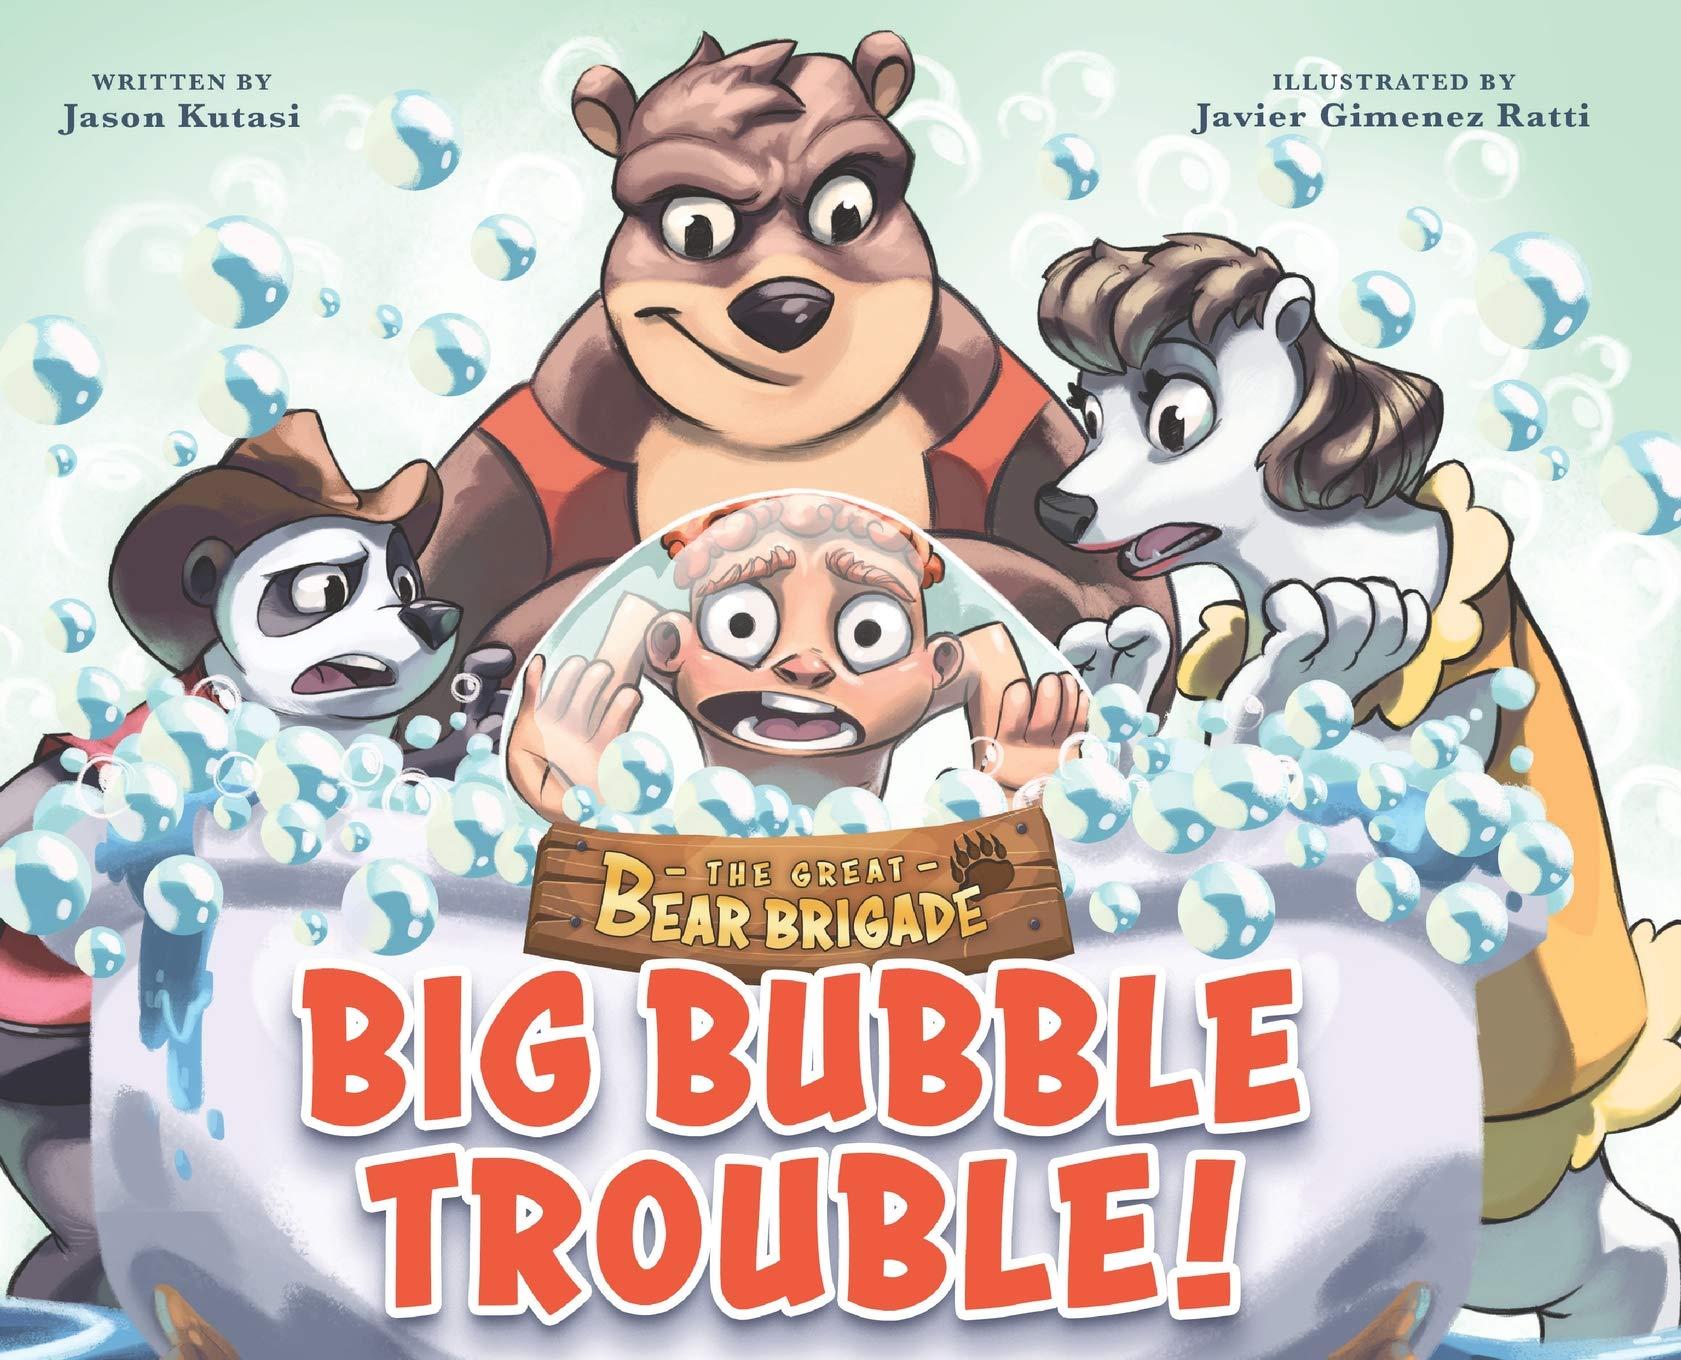 The Great Bear Brigade: Big Bubble Trouble!